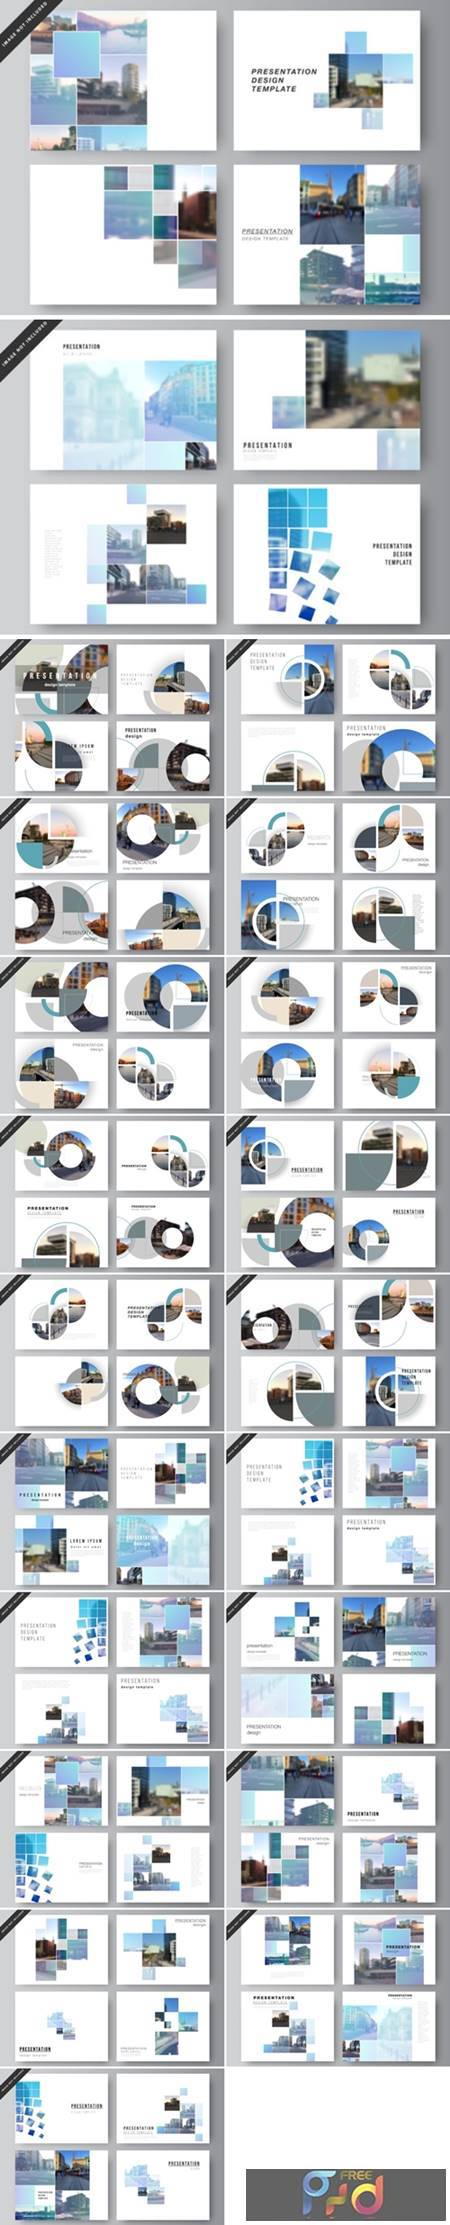 Presentation Design Templates 1